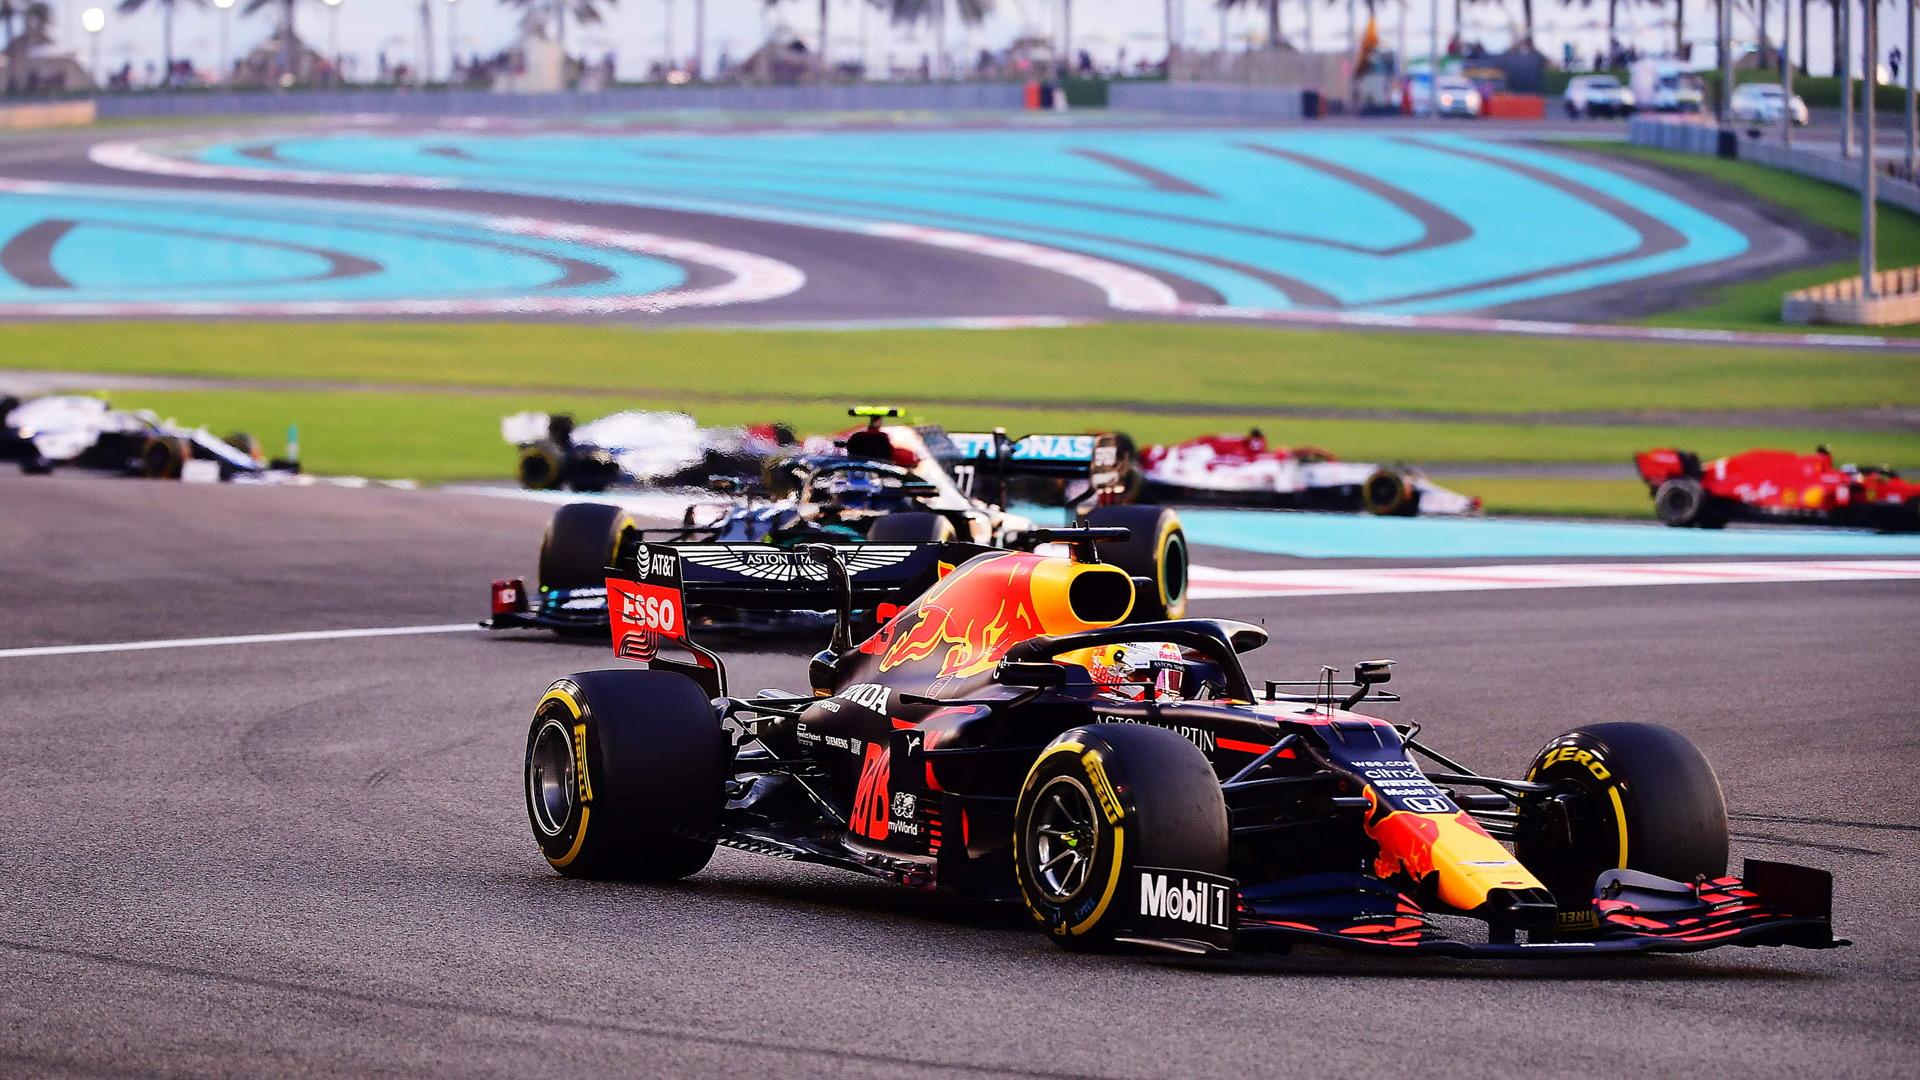 Red Bull Racing's Max Verstappen at the 2020 Formula One Abu Dhabi Grand Prix